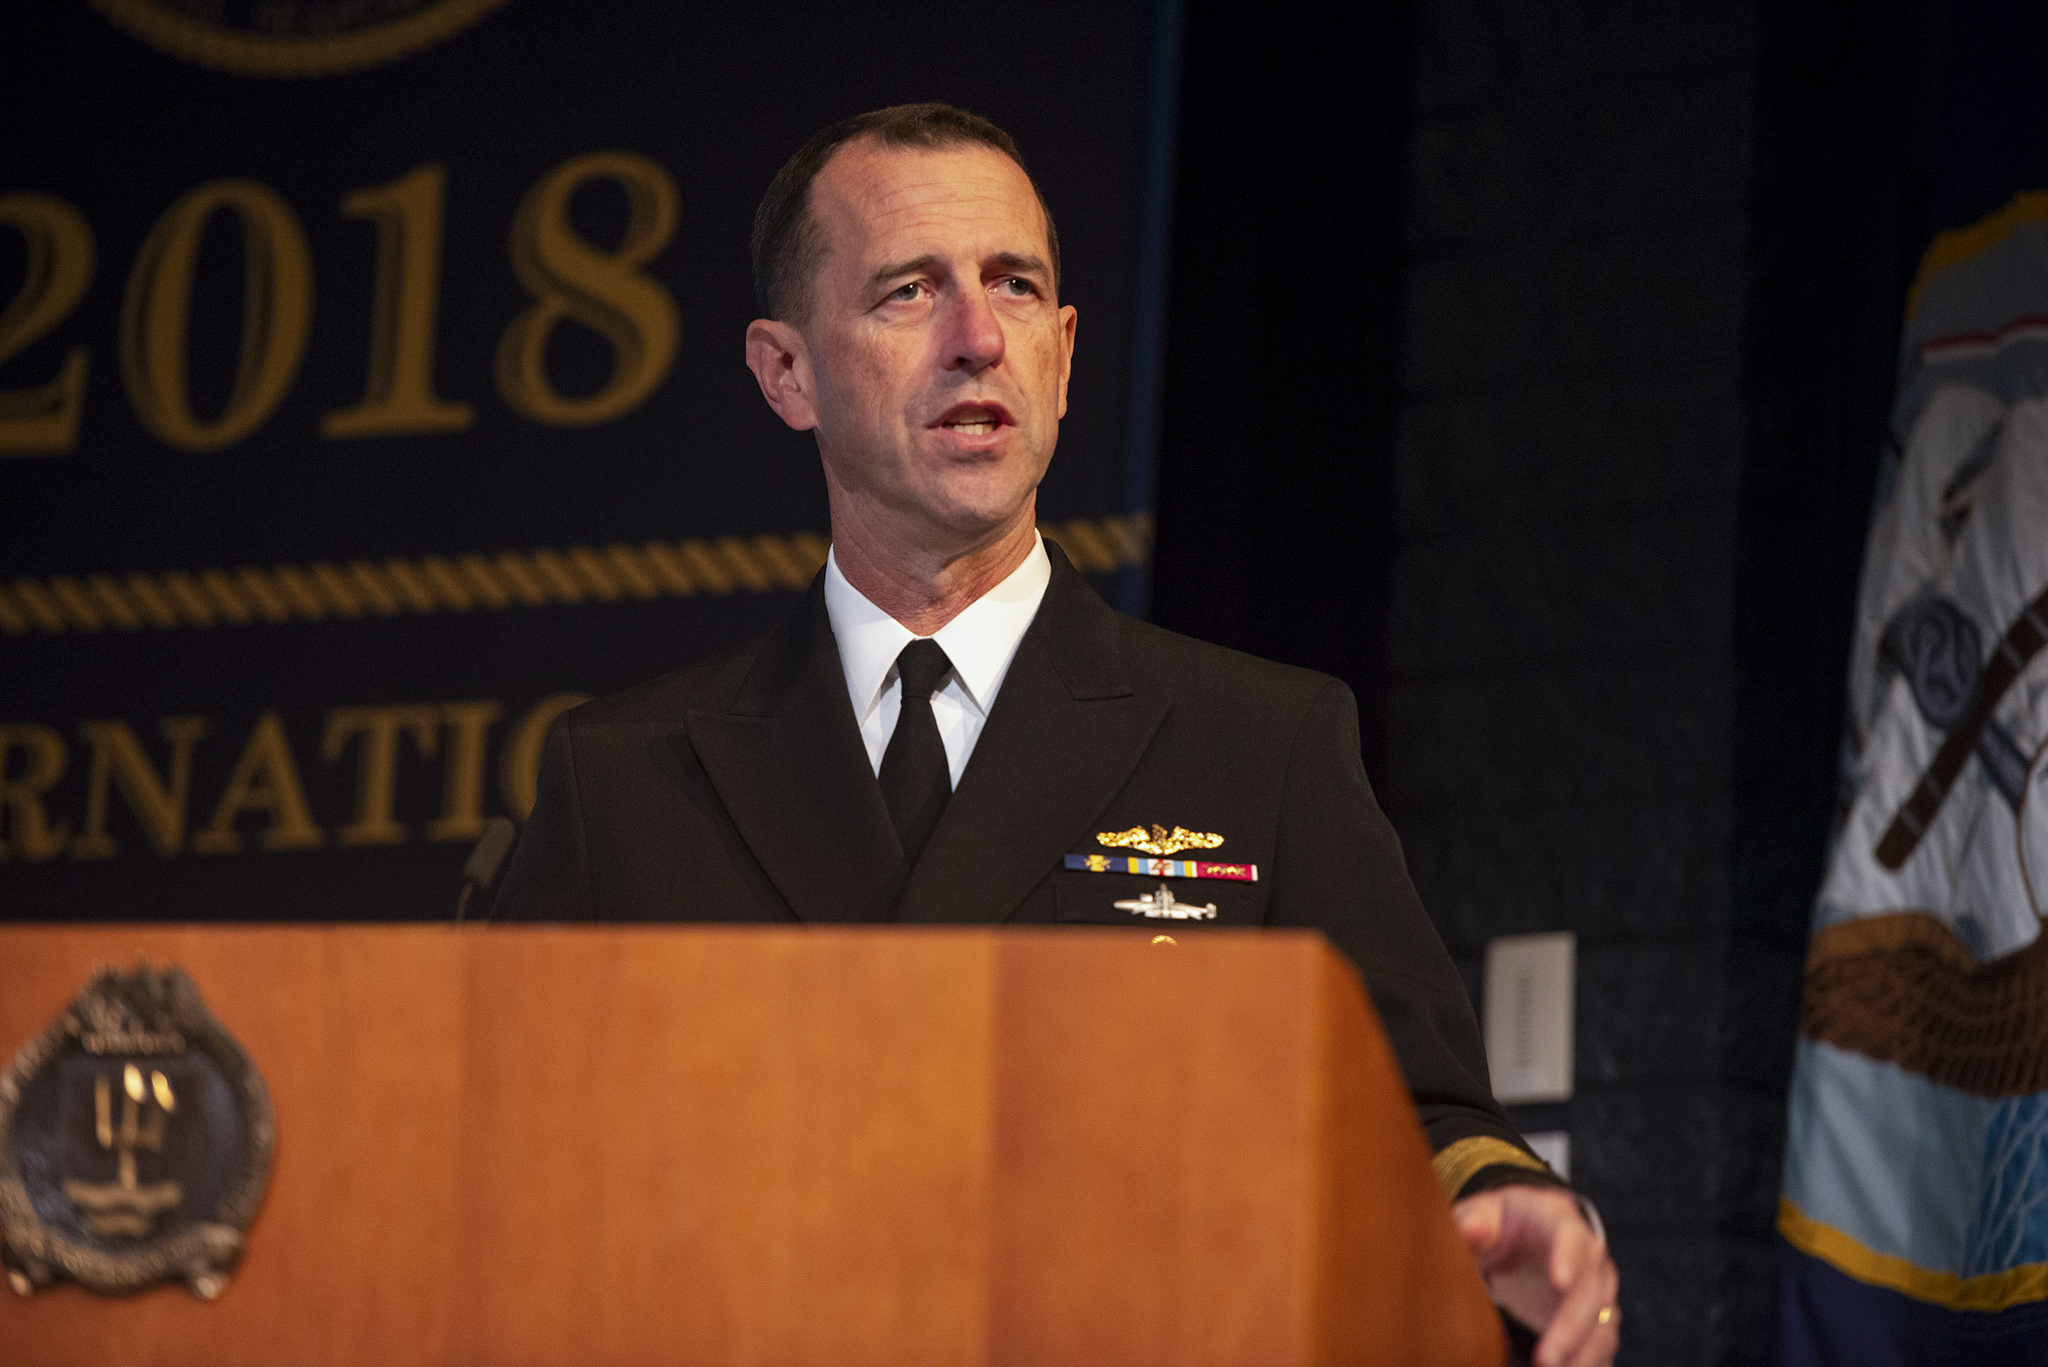 Adm John M. Richardson delivers opening remarks